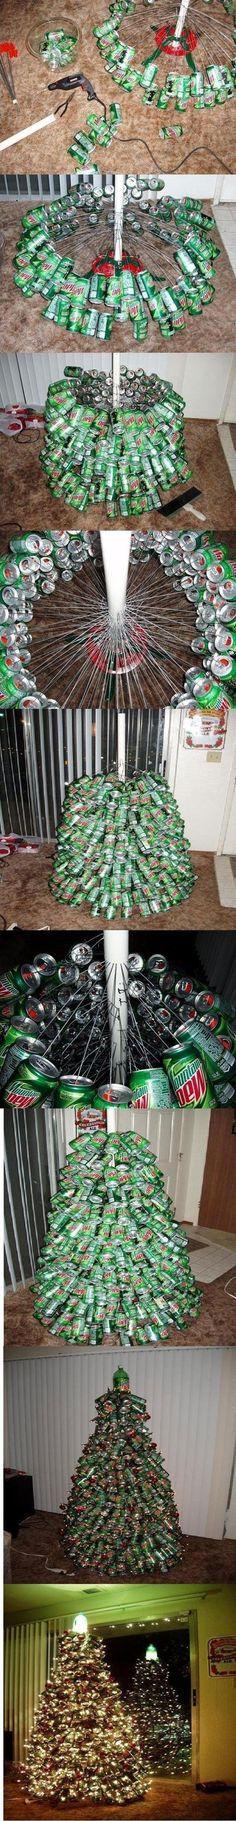 Mountain Dew Christmas Tree #lol #haha #funny